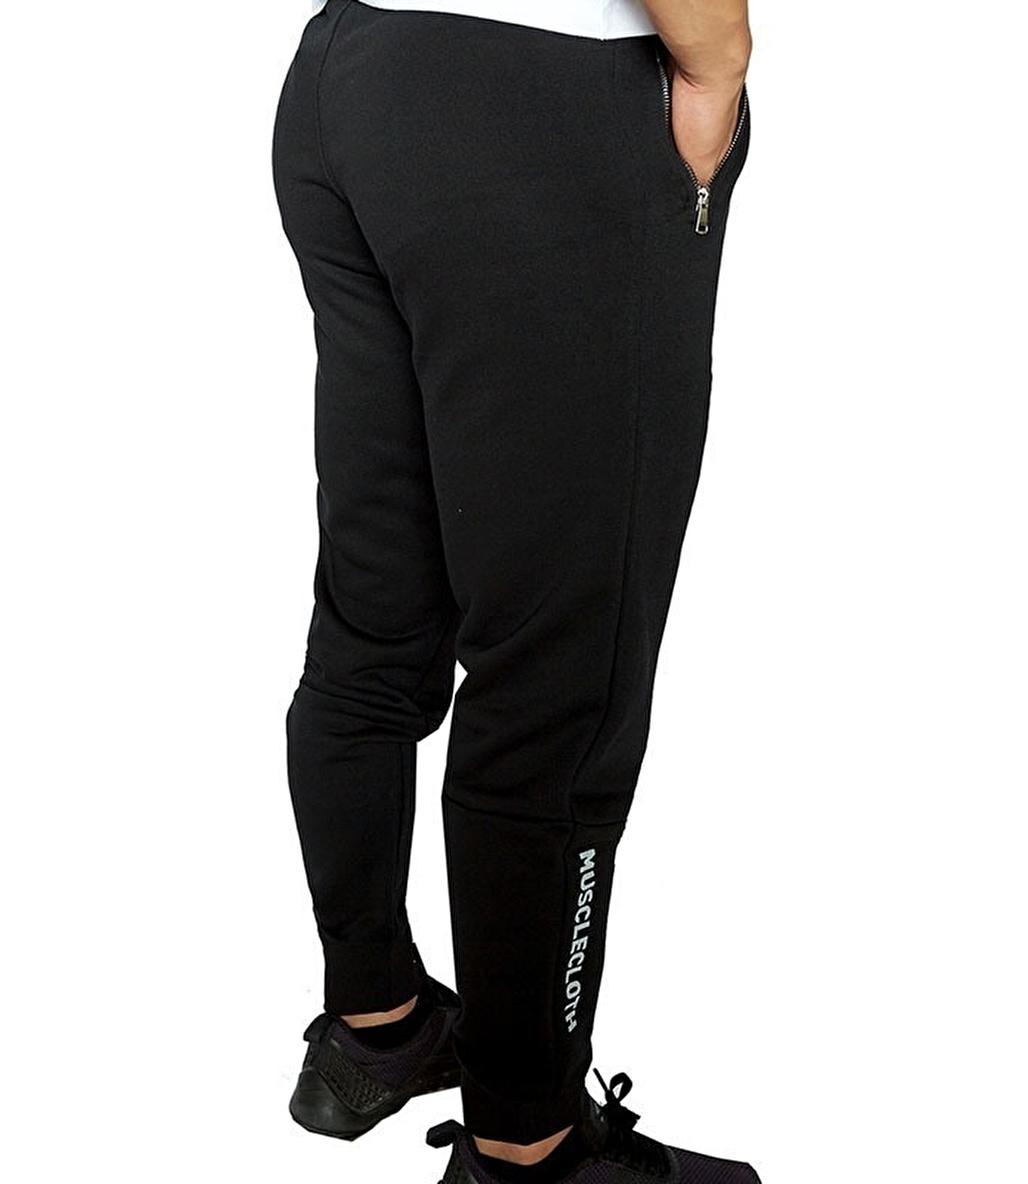 MuscleCloth Training Eşofman Altı Siyah